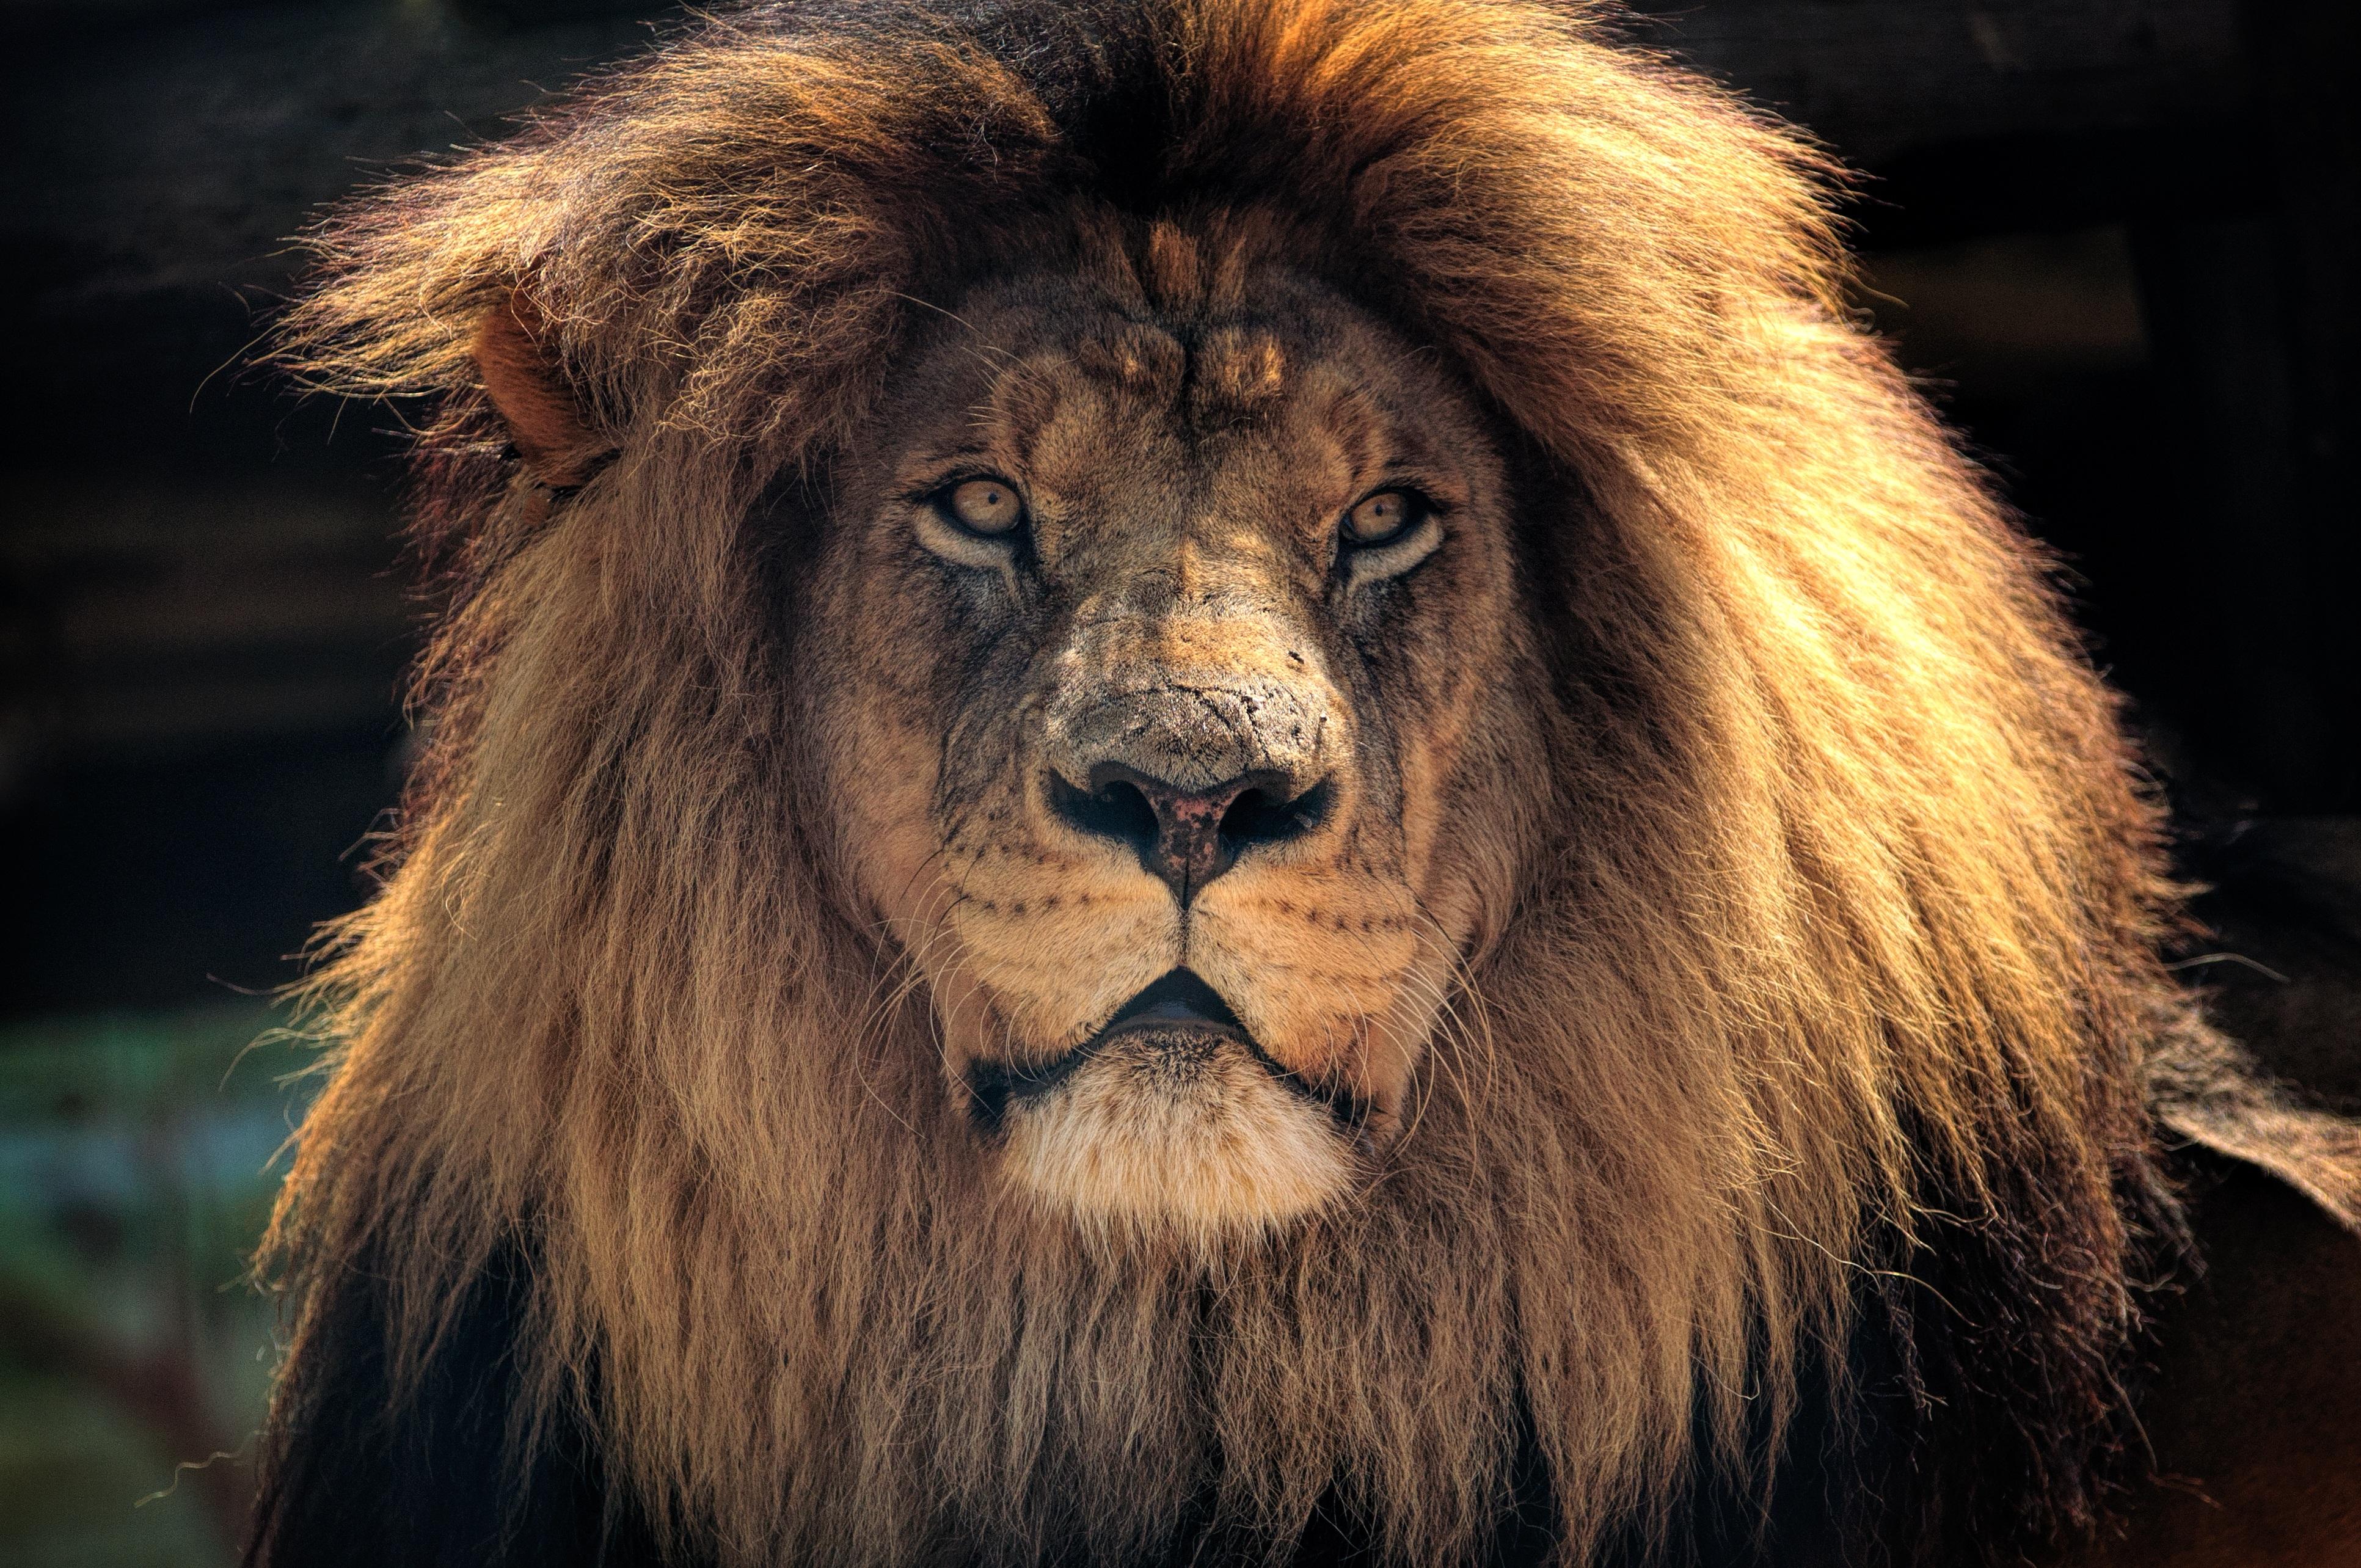 4k lion hd hd animals 4k wallpapers images backgrounds - Lion 4k wallpaper for mobile ...